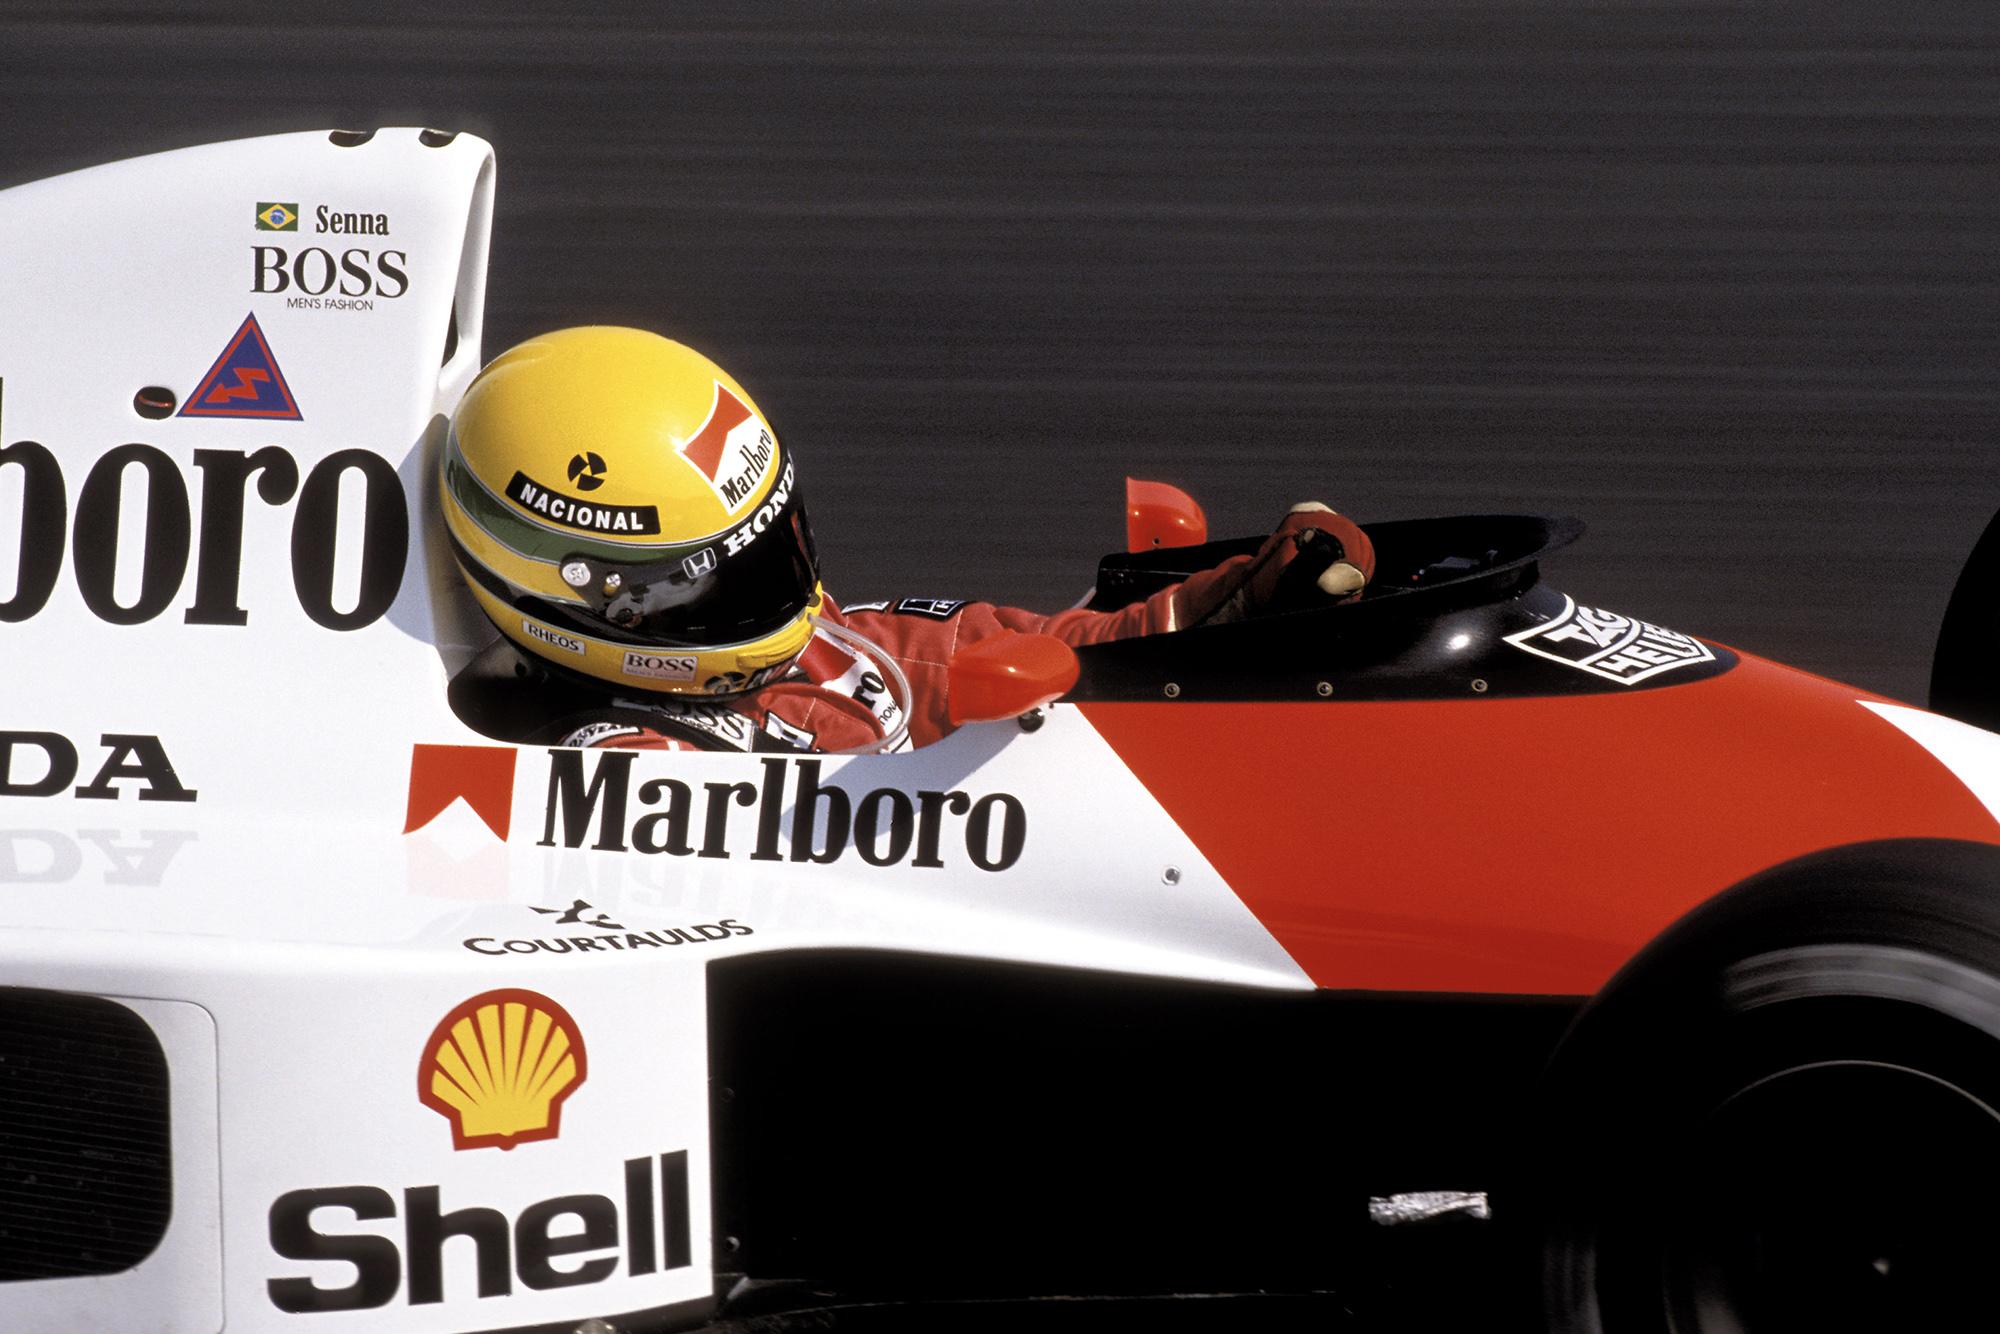 Ayrton Senna at the 1990 Hungarian Grand Prix